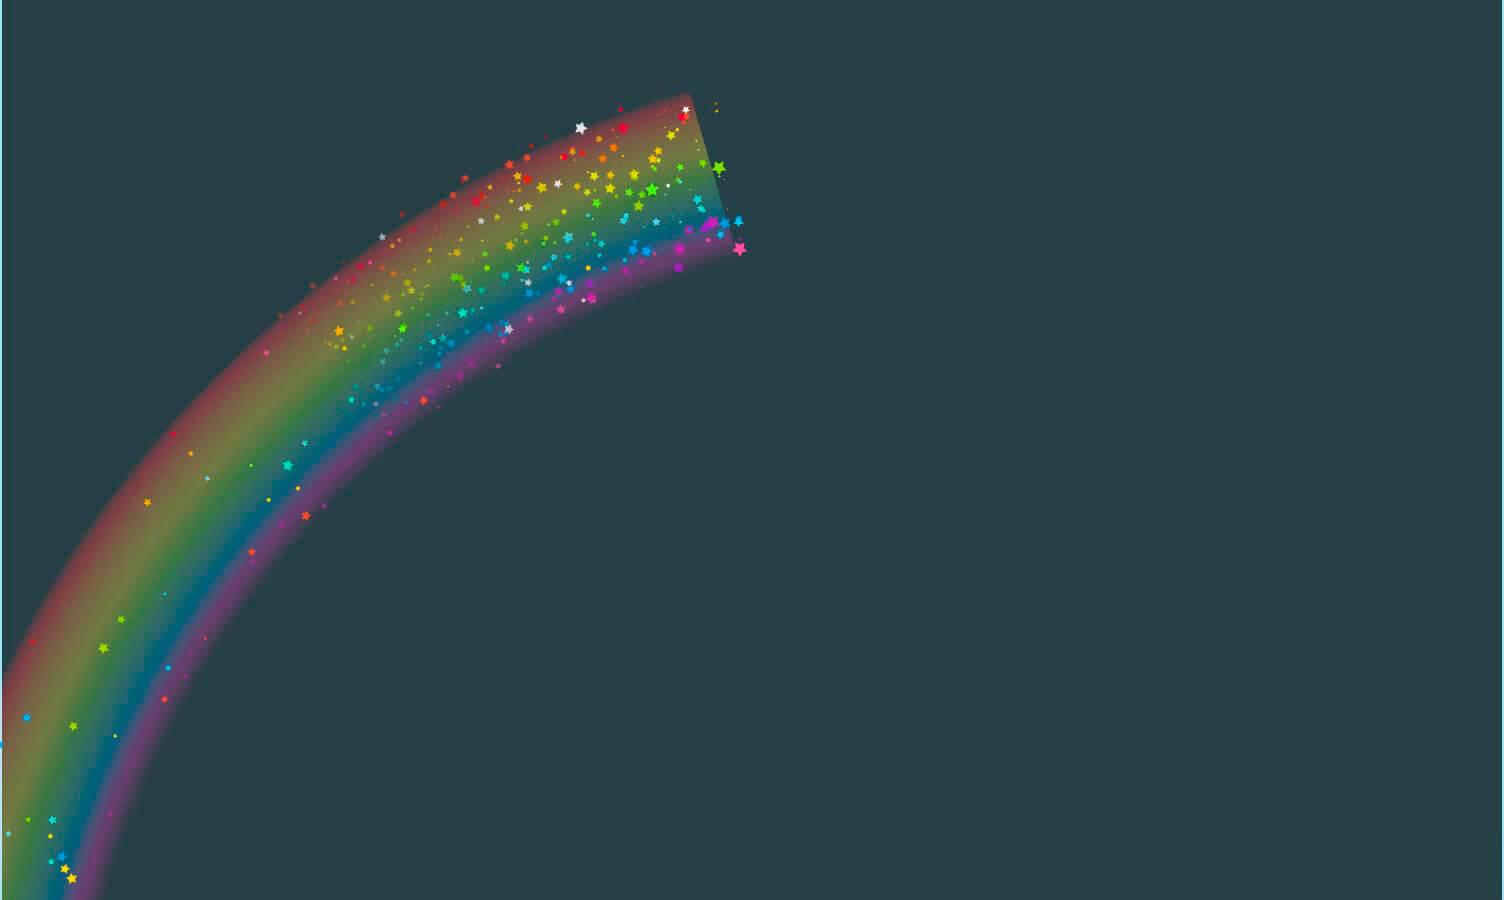 Картинки про, анимация радуга картинки